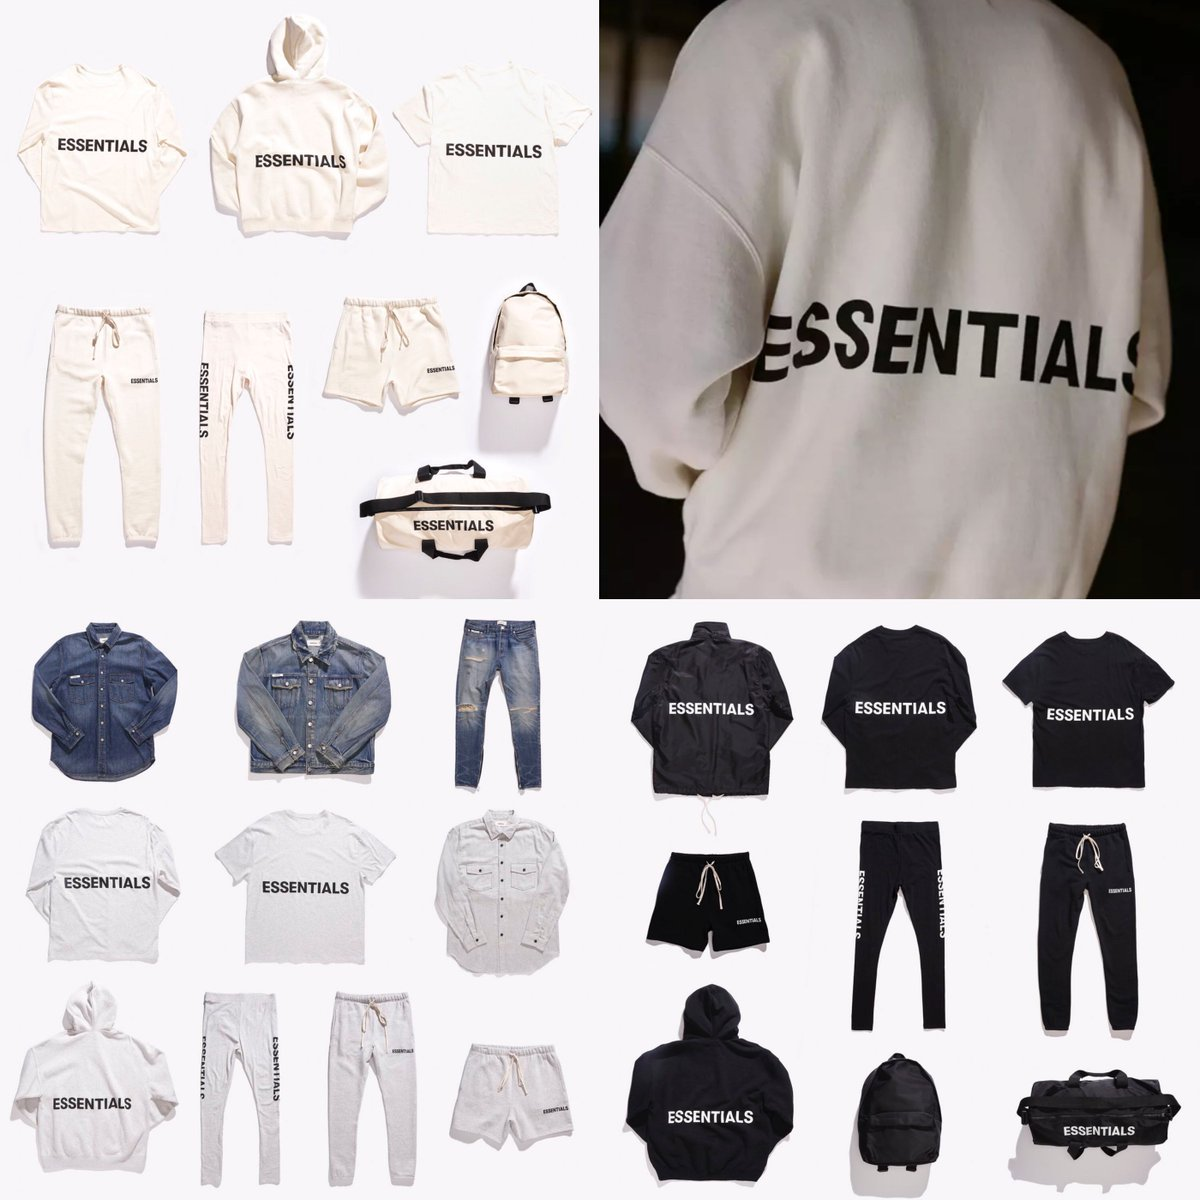 Pacsun essentials